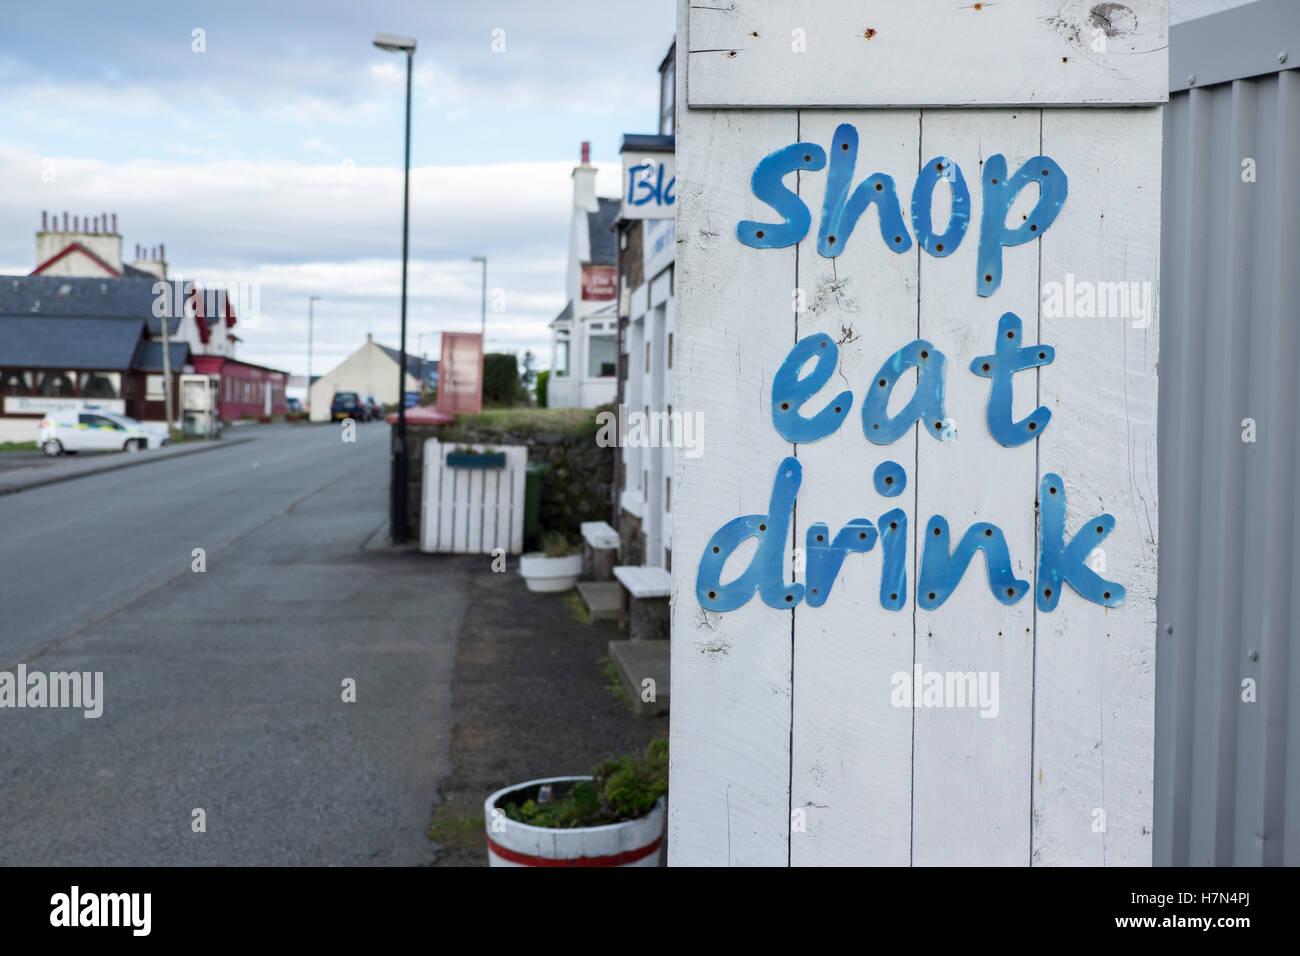 Holzschild, Shop, Essen, trinken, Dunvegan, Isle Of Skye, Schottland Stockbild